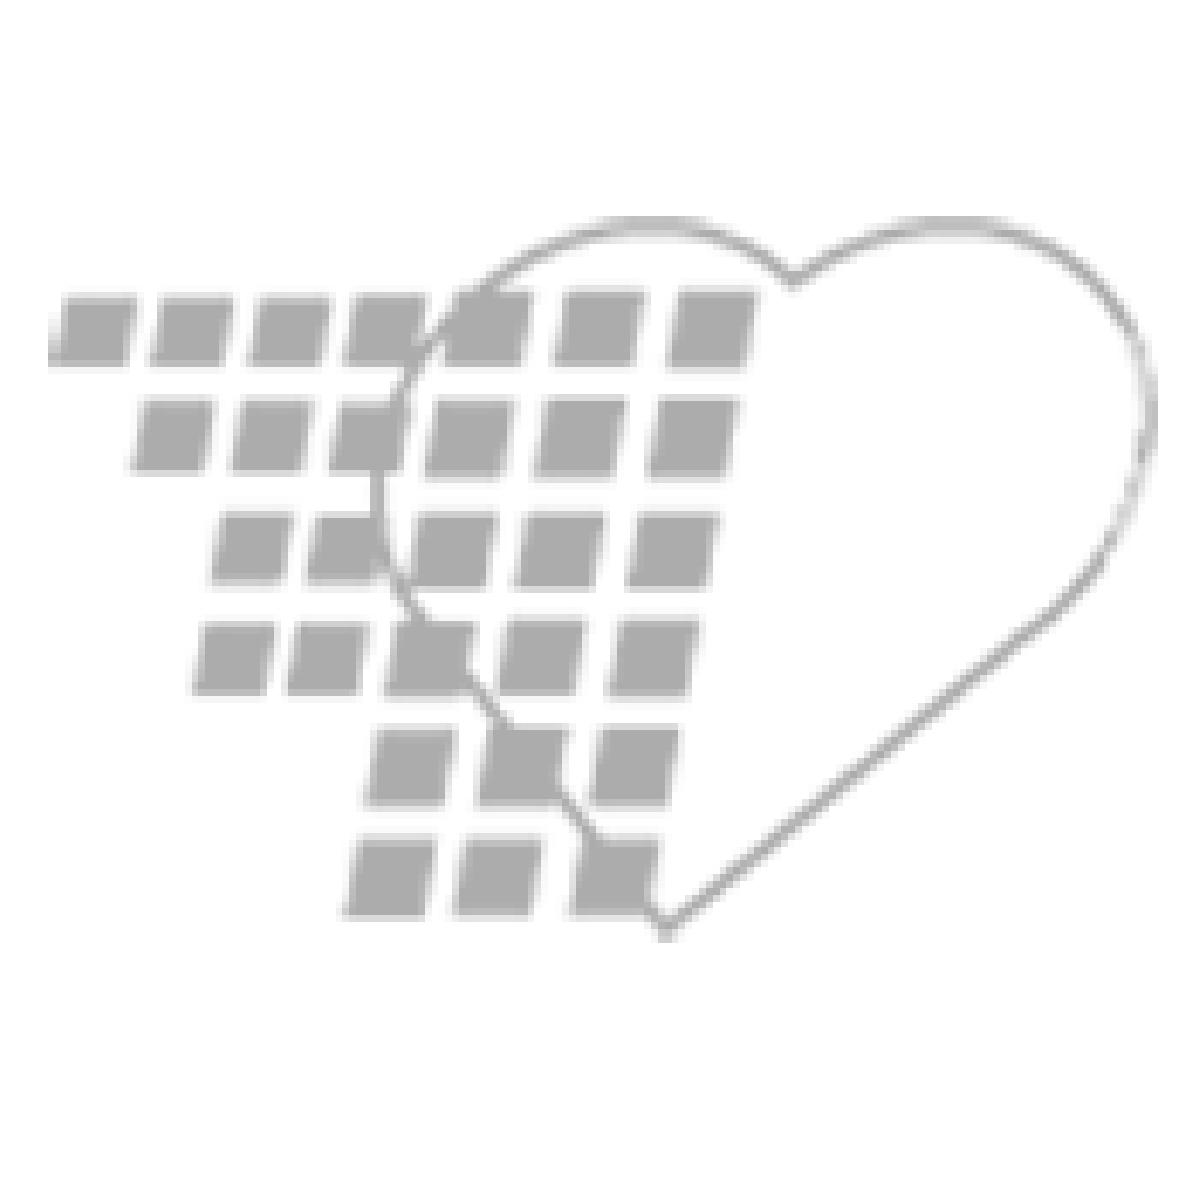 06-93-2014 - Demo Dose® 5mL Clear Ampule